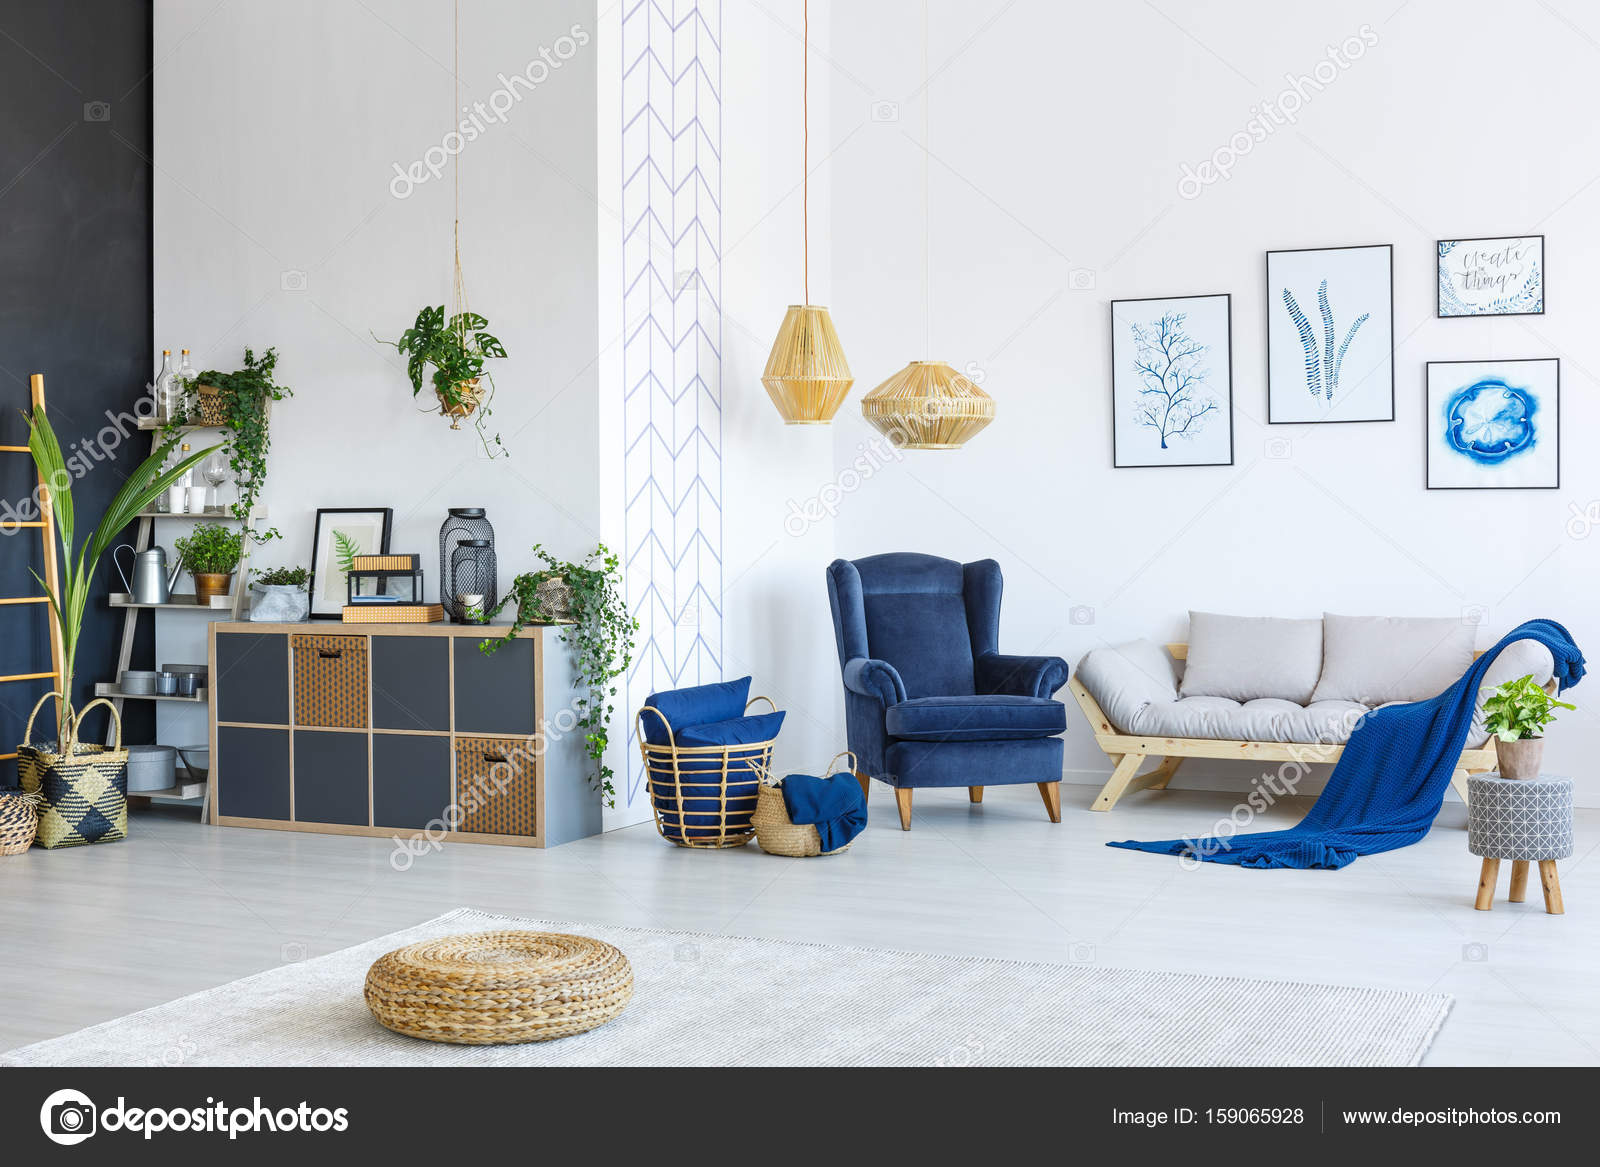 wit en blauw woonkamer — Stockfoto © photographee.eu #159065928